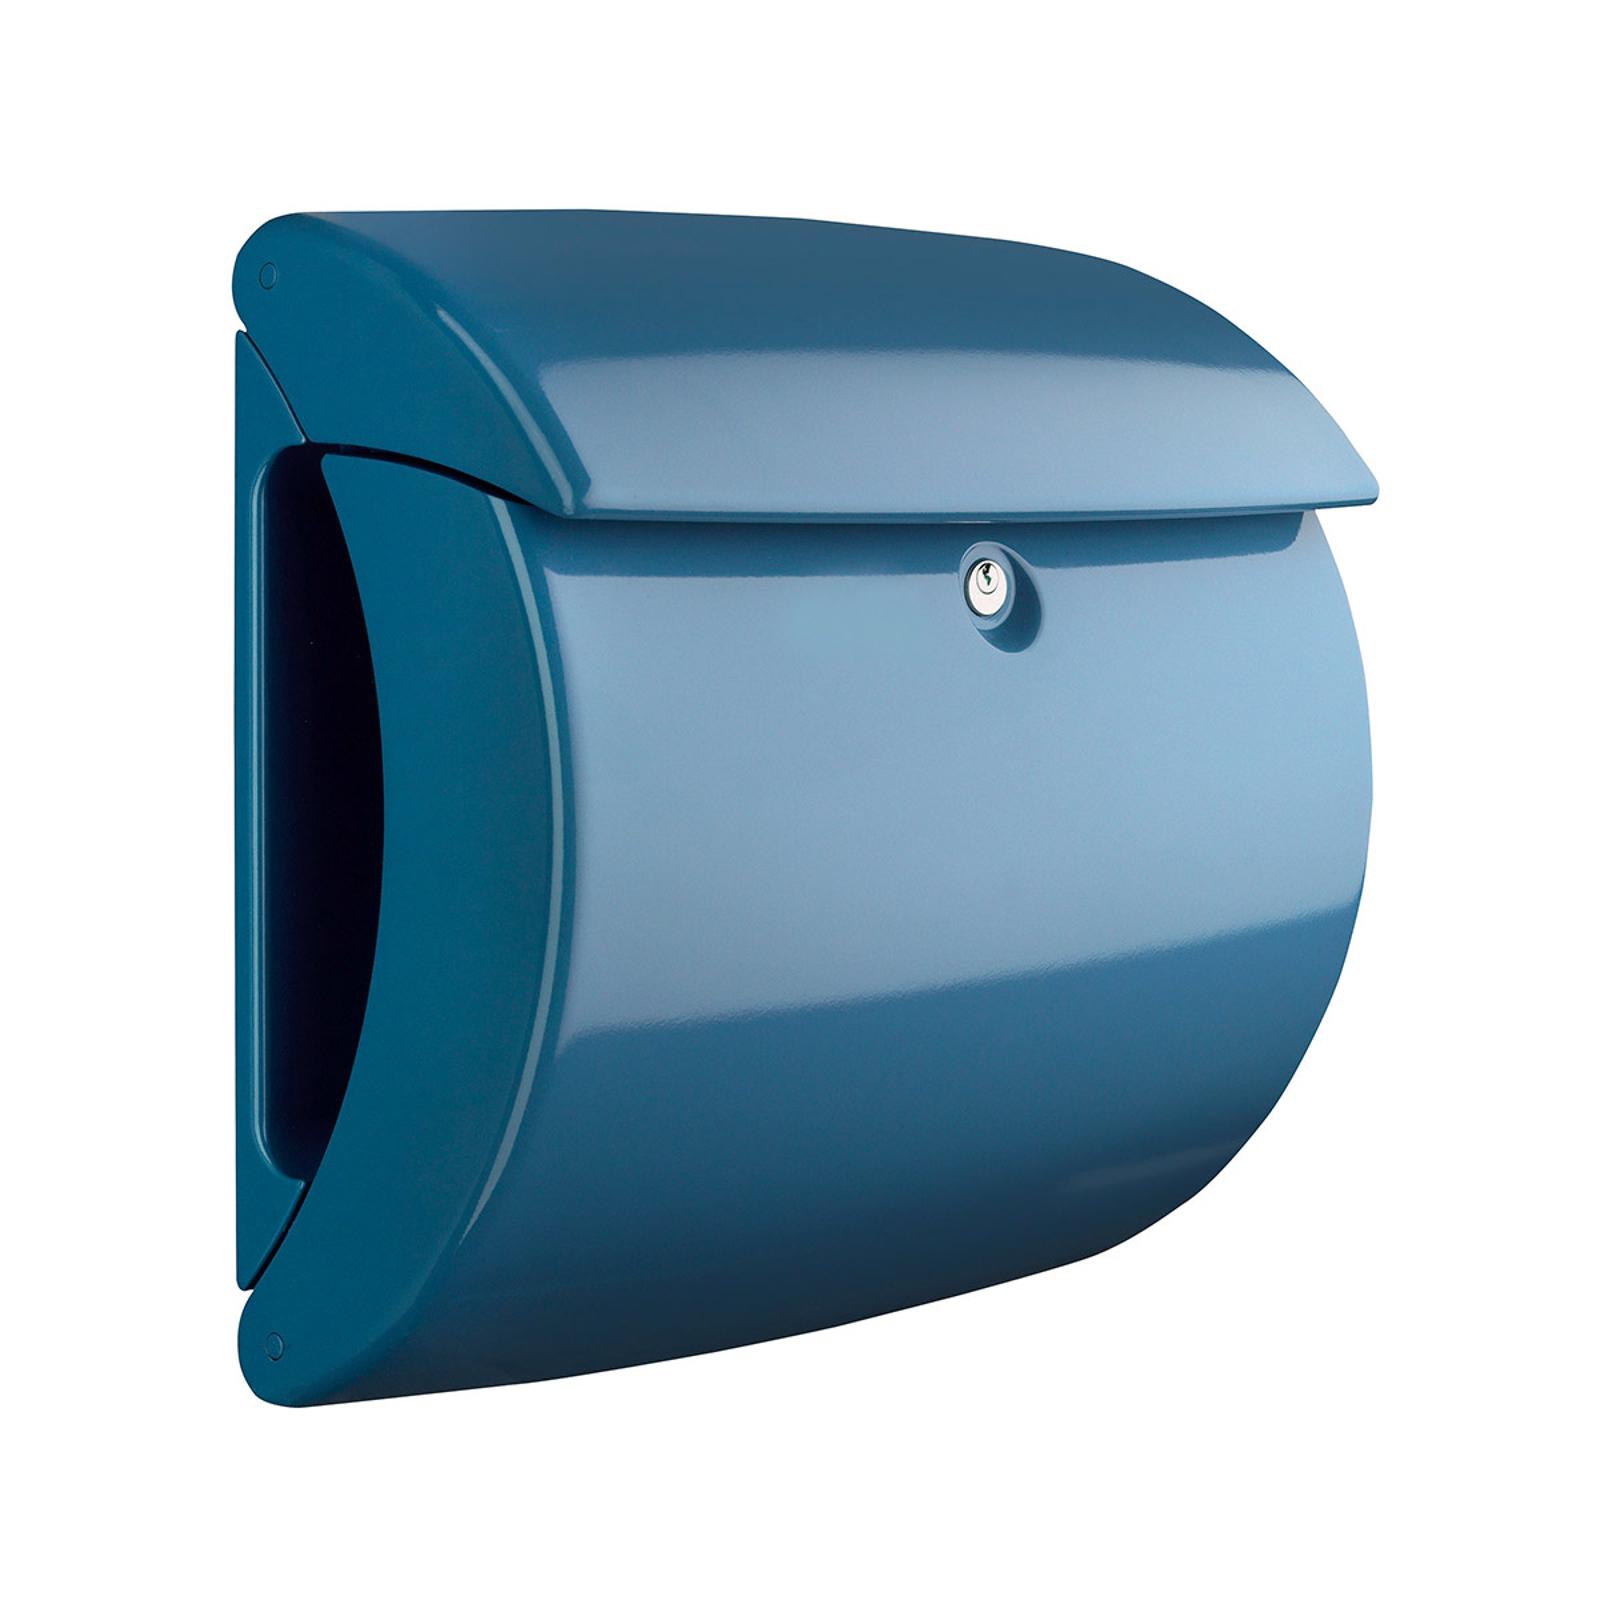 Briefkasten Piano 886 light blue